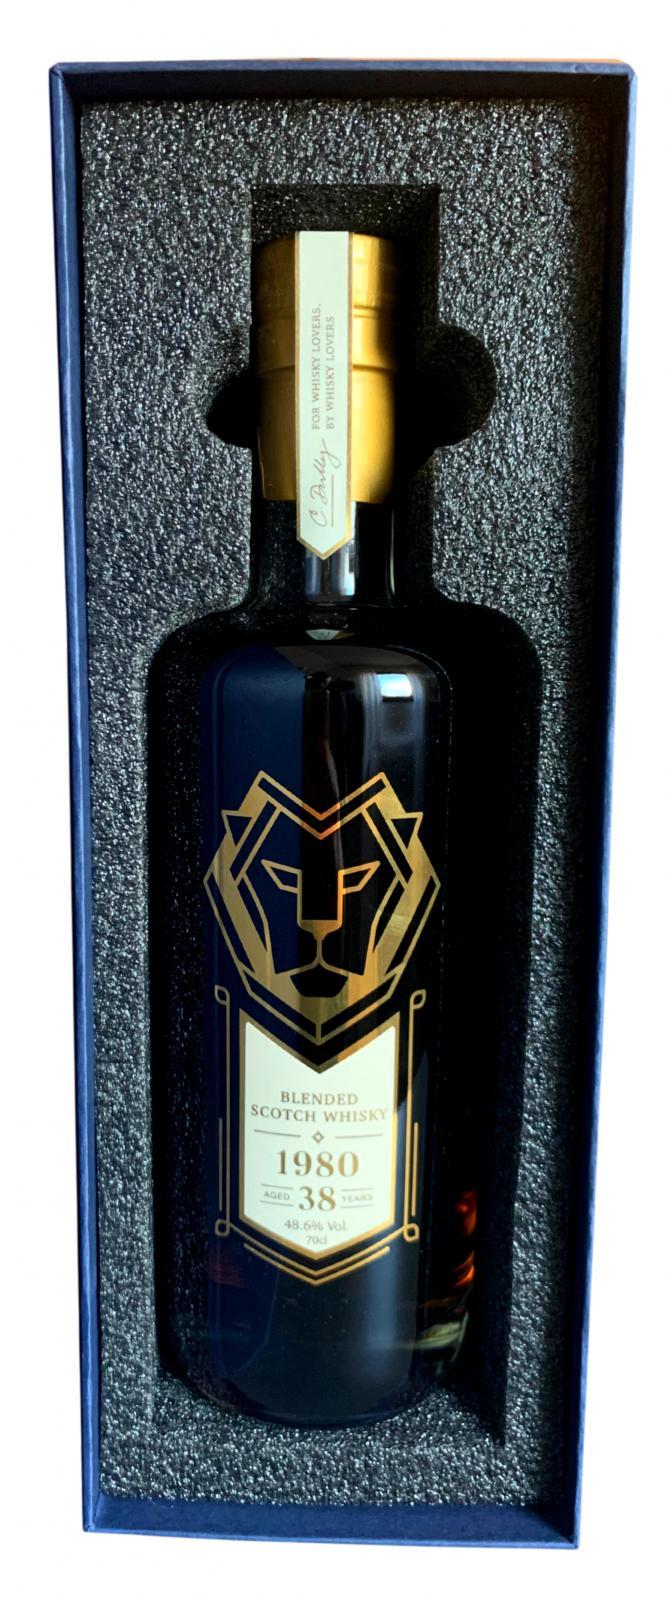 Blended Scotch Whisky 1980 CDuS